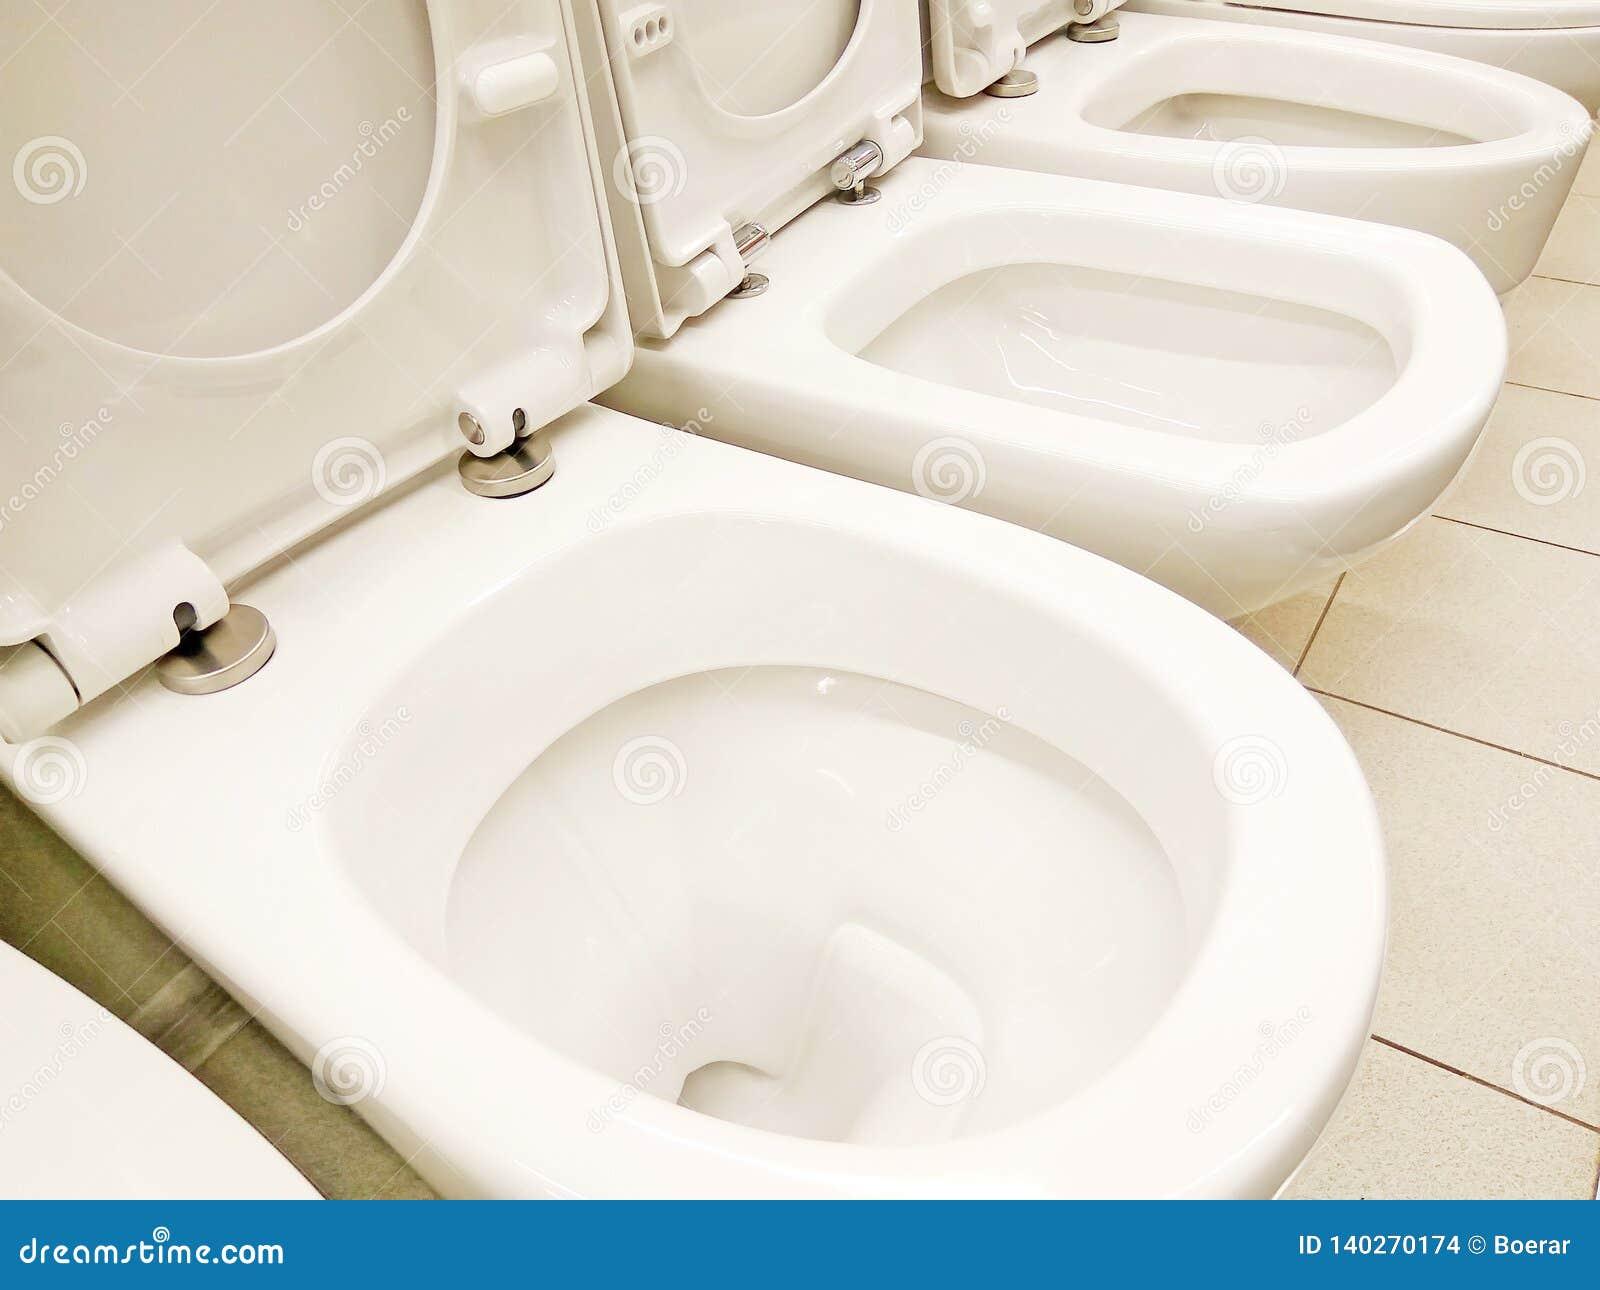 Groep nieuwe schone witte geopende toiletkommen